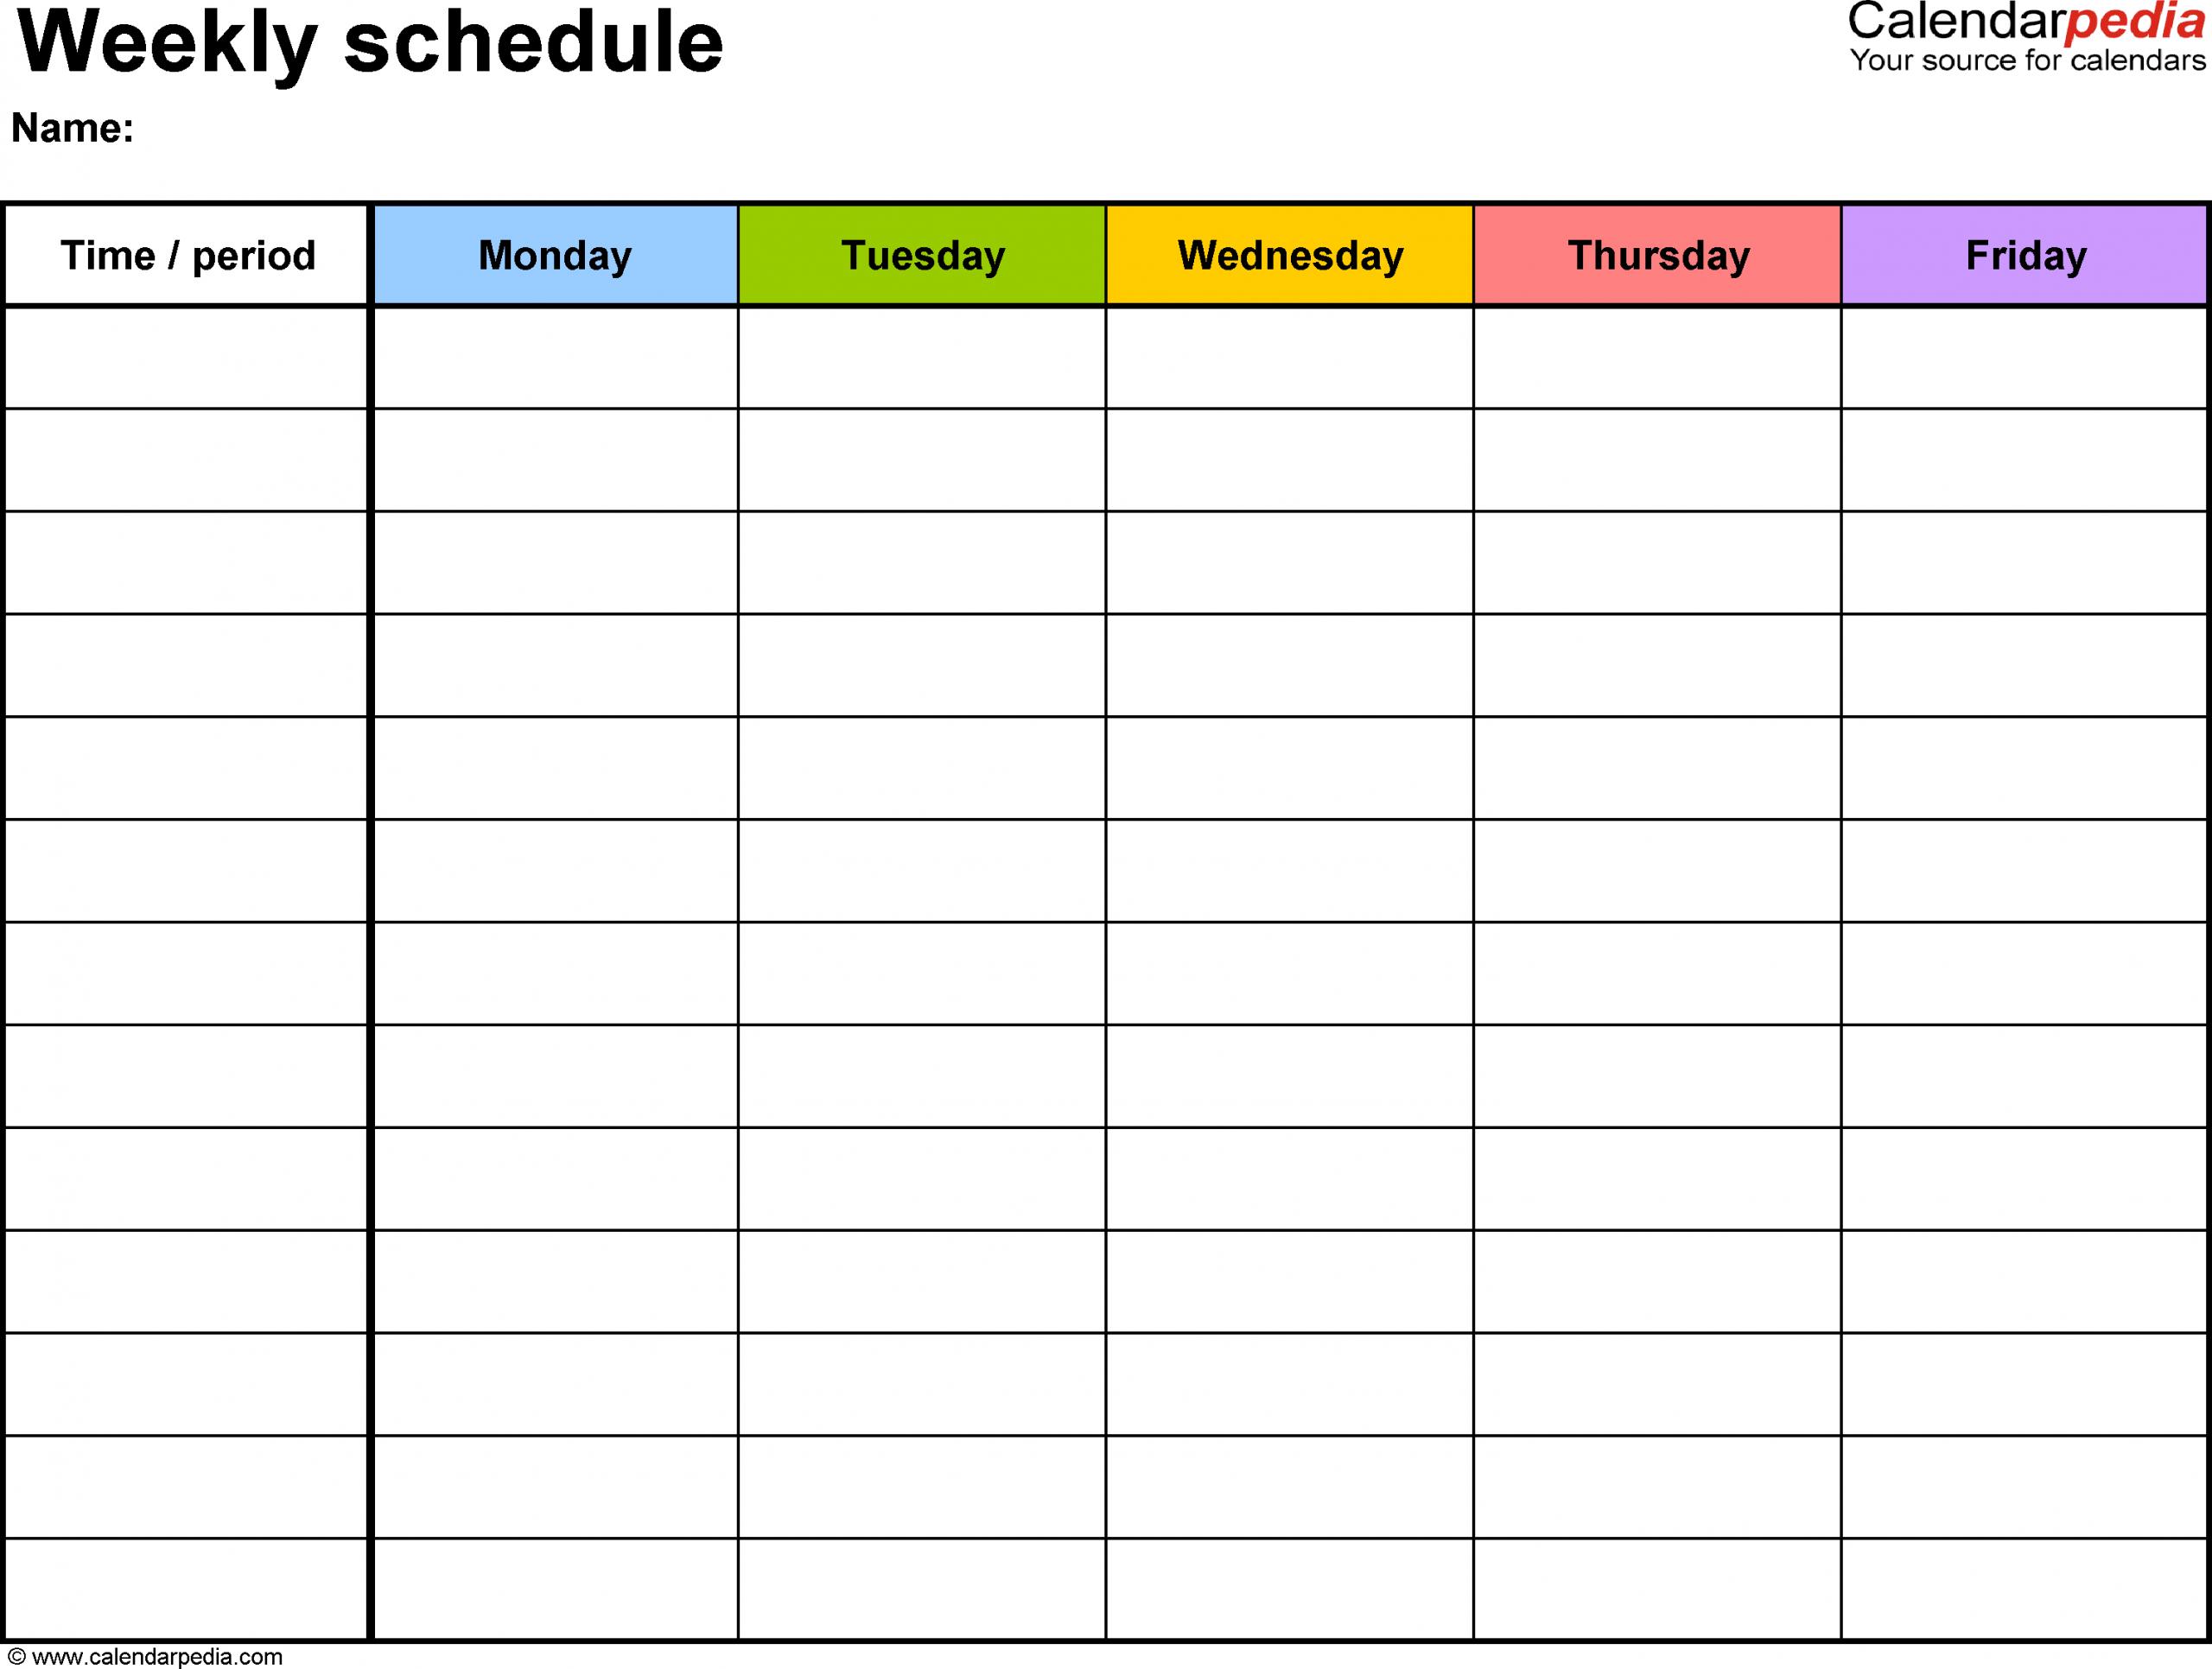 Weekly Calendar Template - Fotolip Printable 7 Day Calendars Free